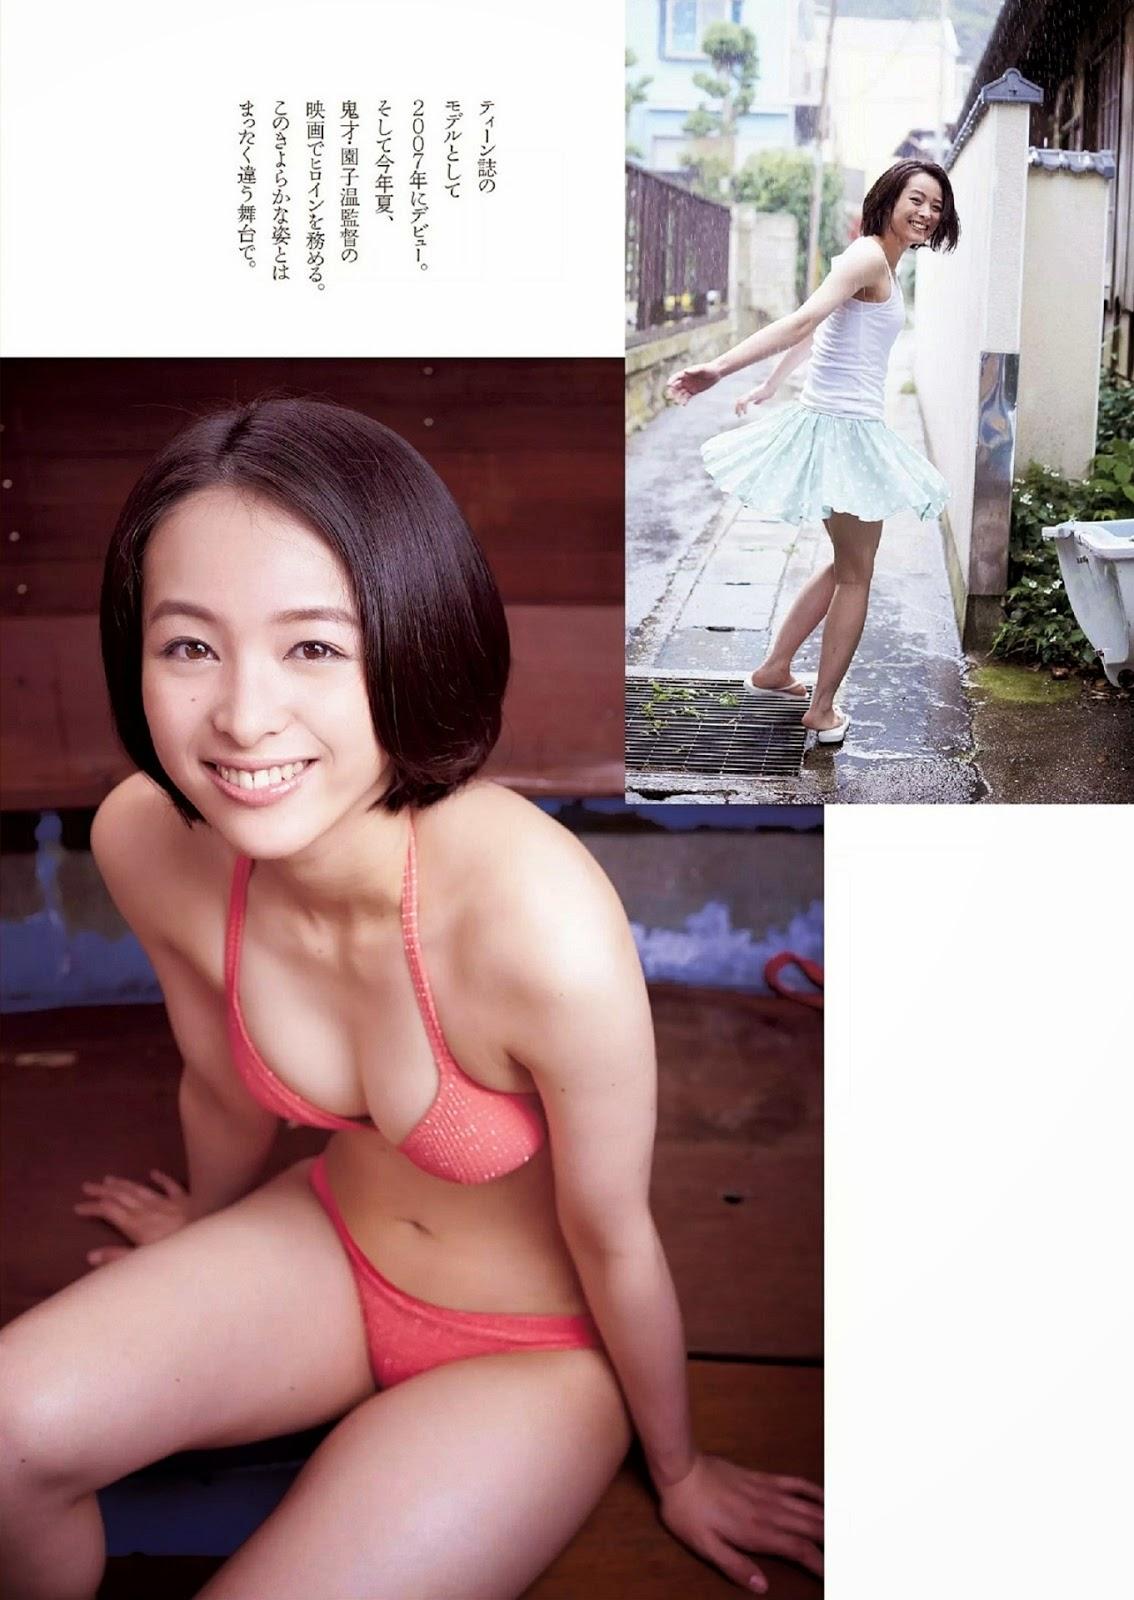 Seino Nana 清野菜名 Weekly Playboy July 2014 Photos 4